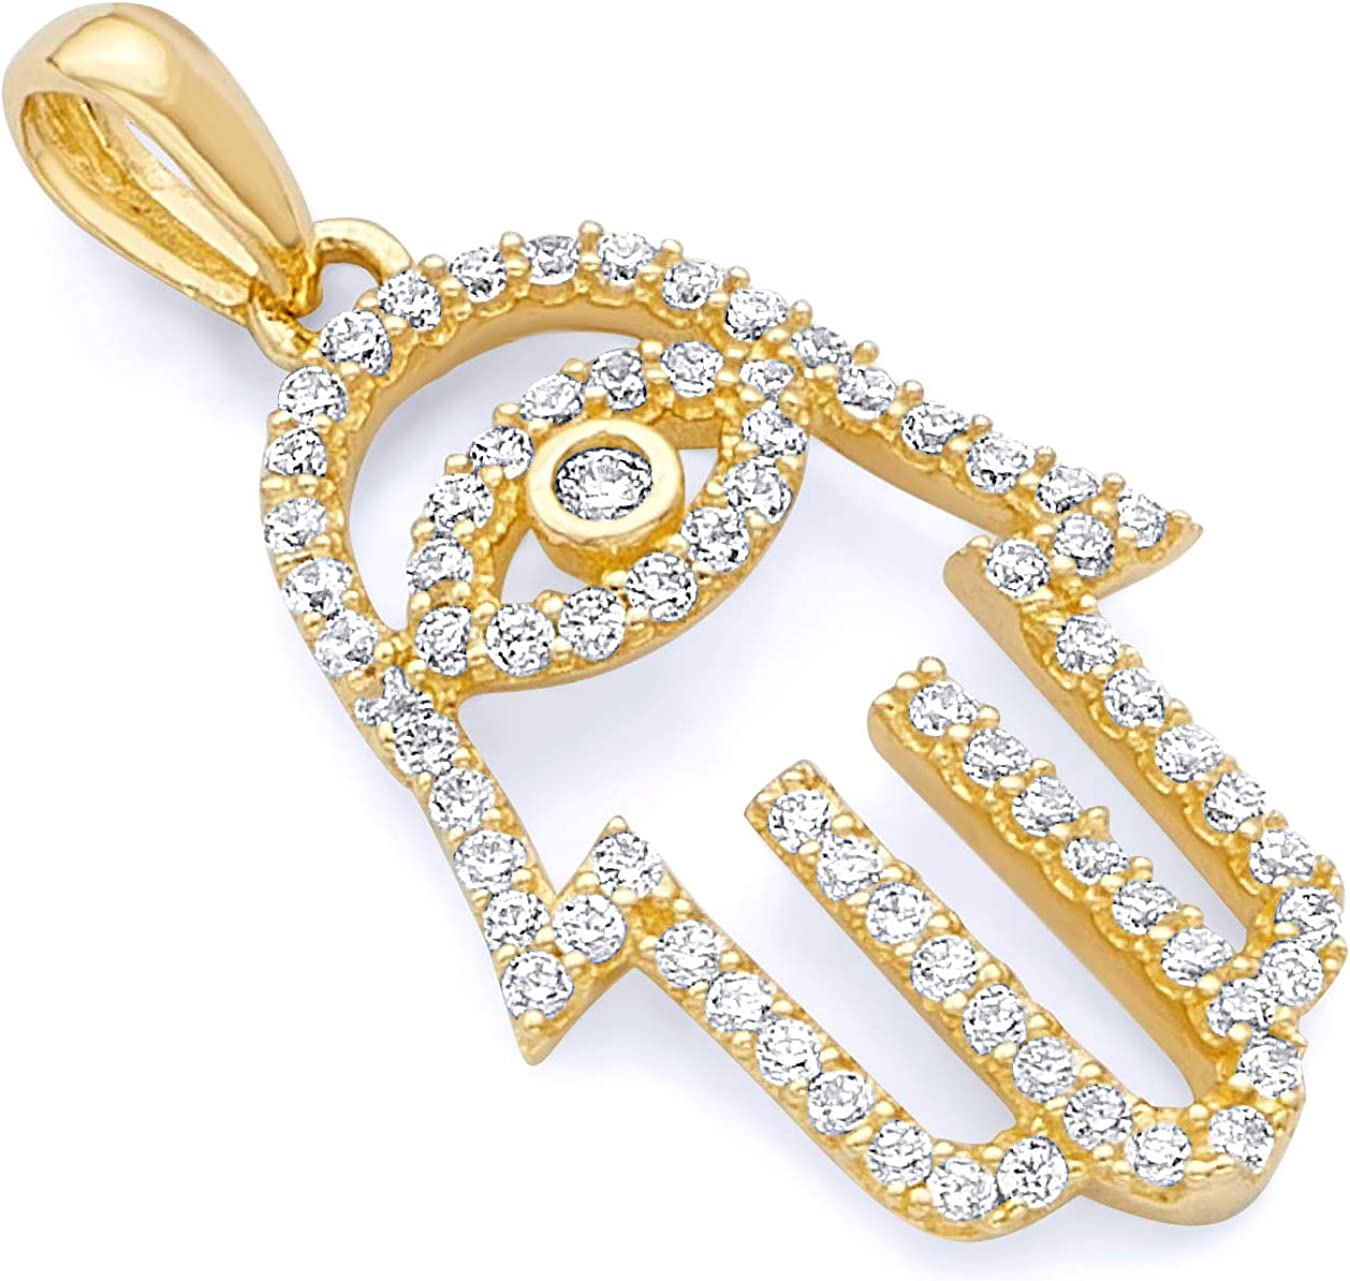 14k REAL Yellow Gold Hamsa Hand CZ Charm Pendant